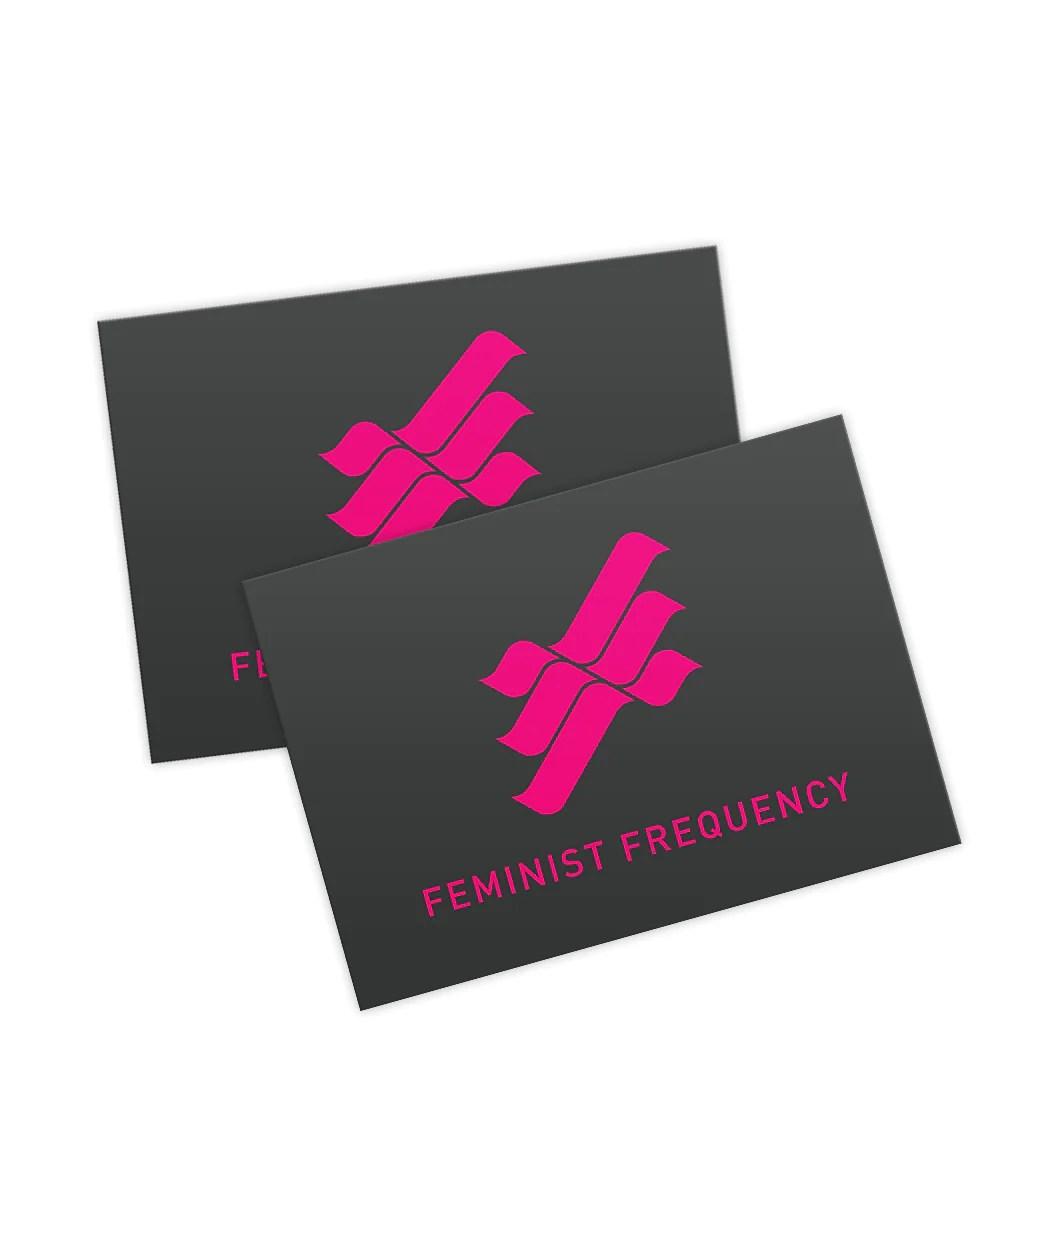 feminist frequency logo sticker